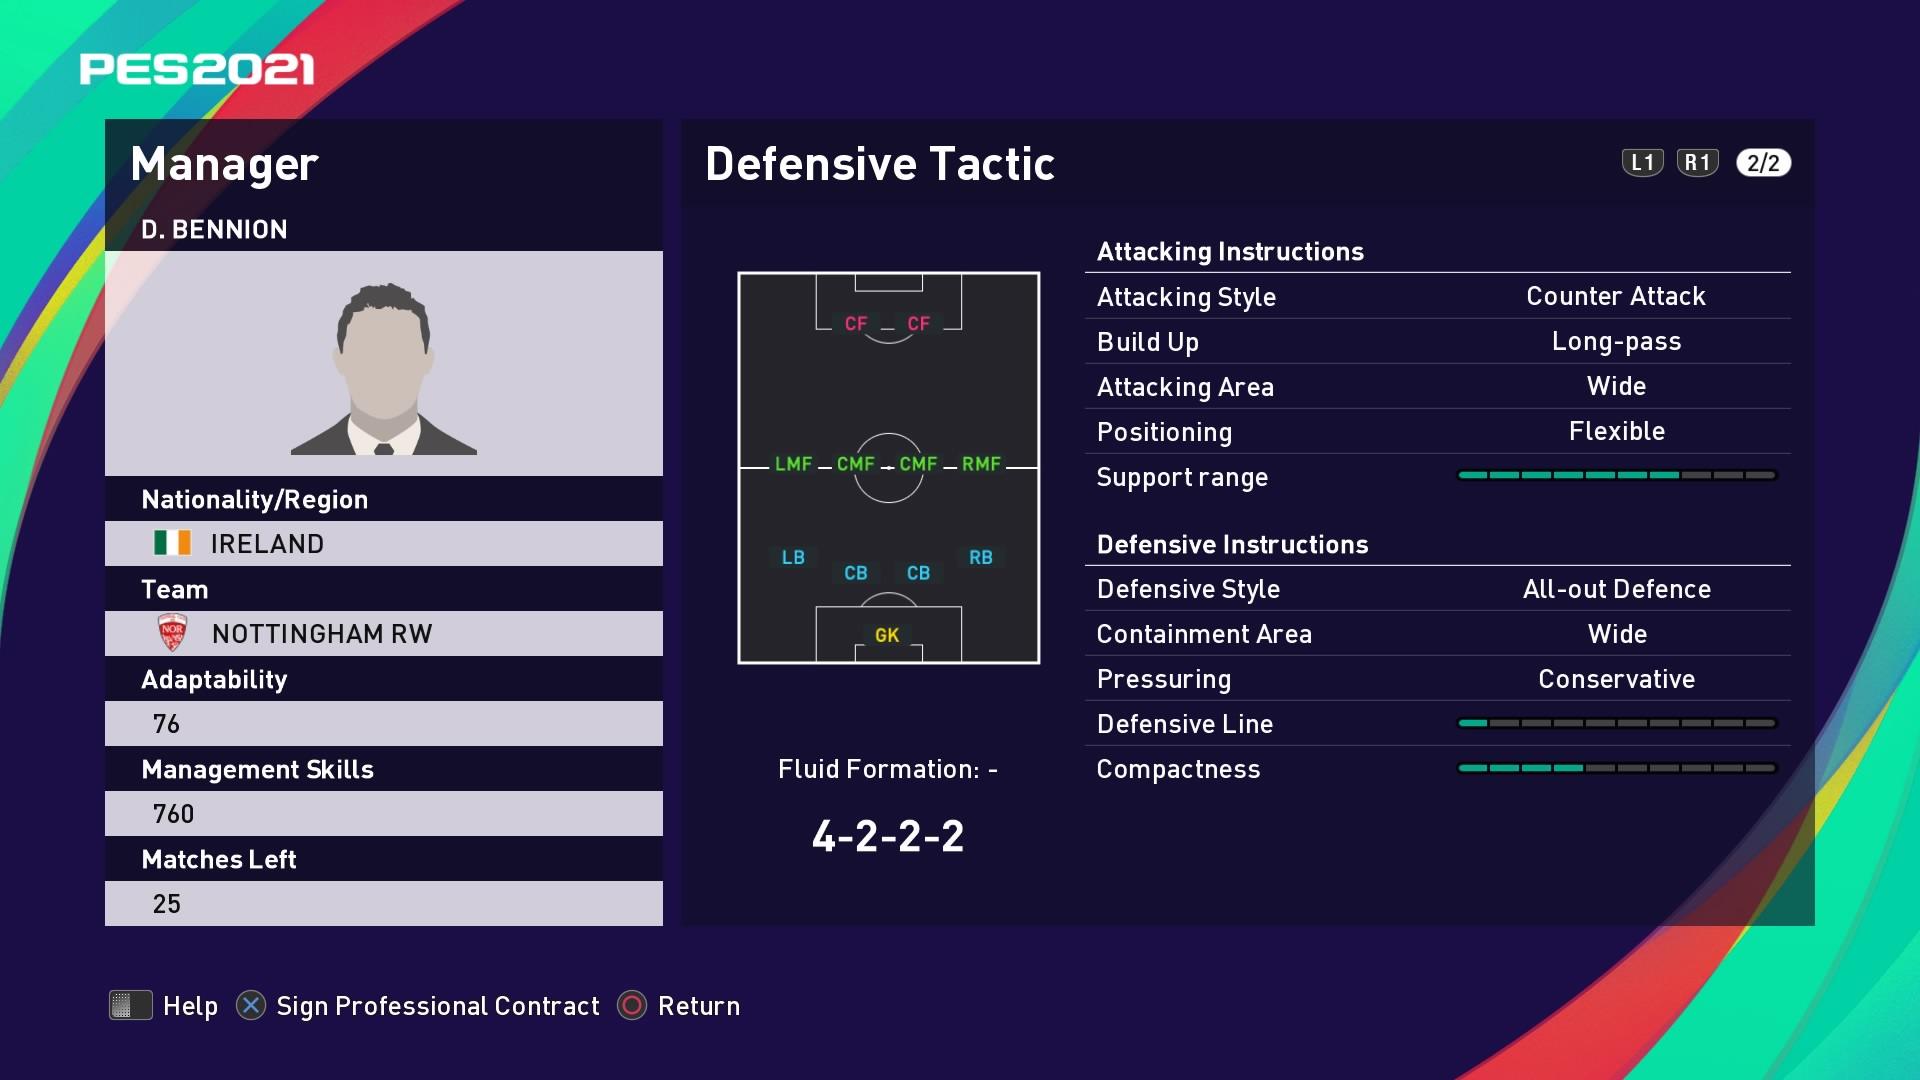 D. Bennion (Chris Hughton) Defensive Tactic in PES 2021 myClub